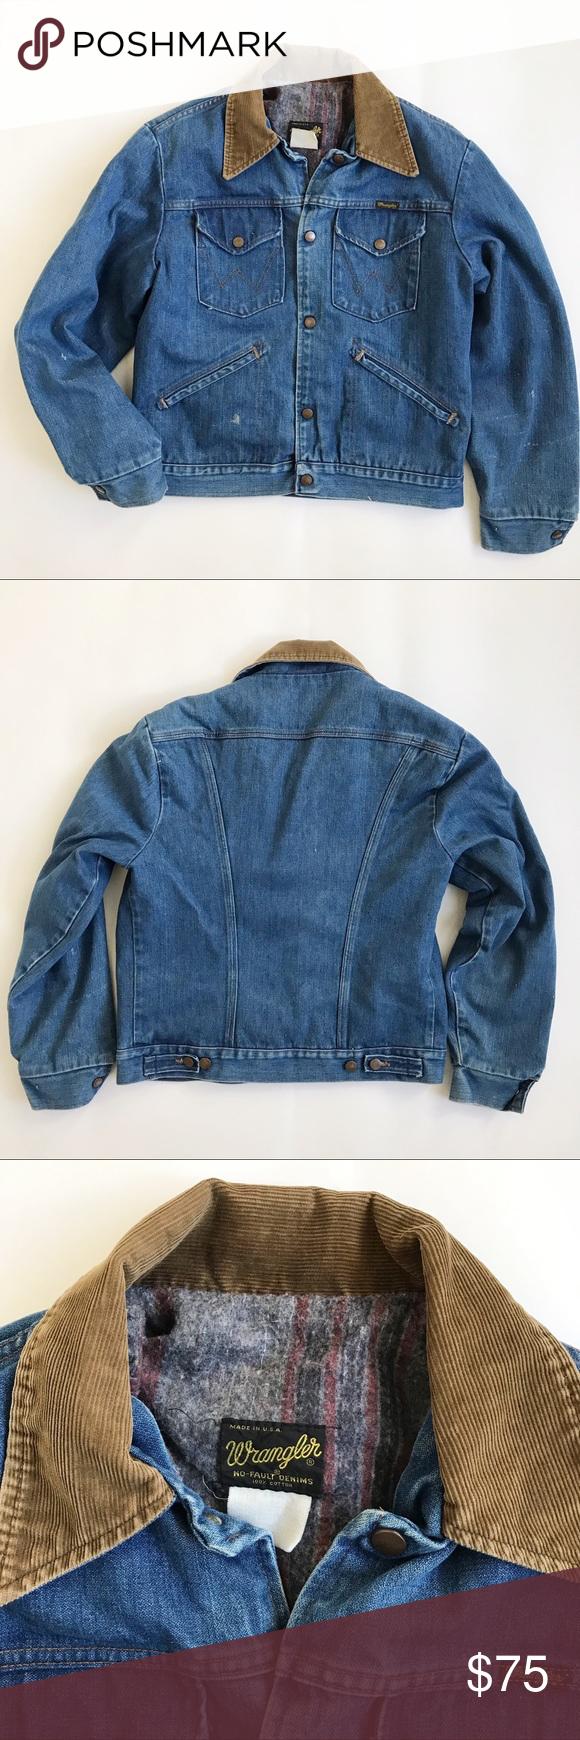 Wrangler Vintage Corduroy Collar Jean Jacket S M Clothes Design Jean Jacket Fashion